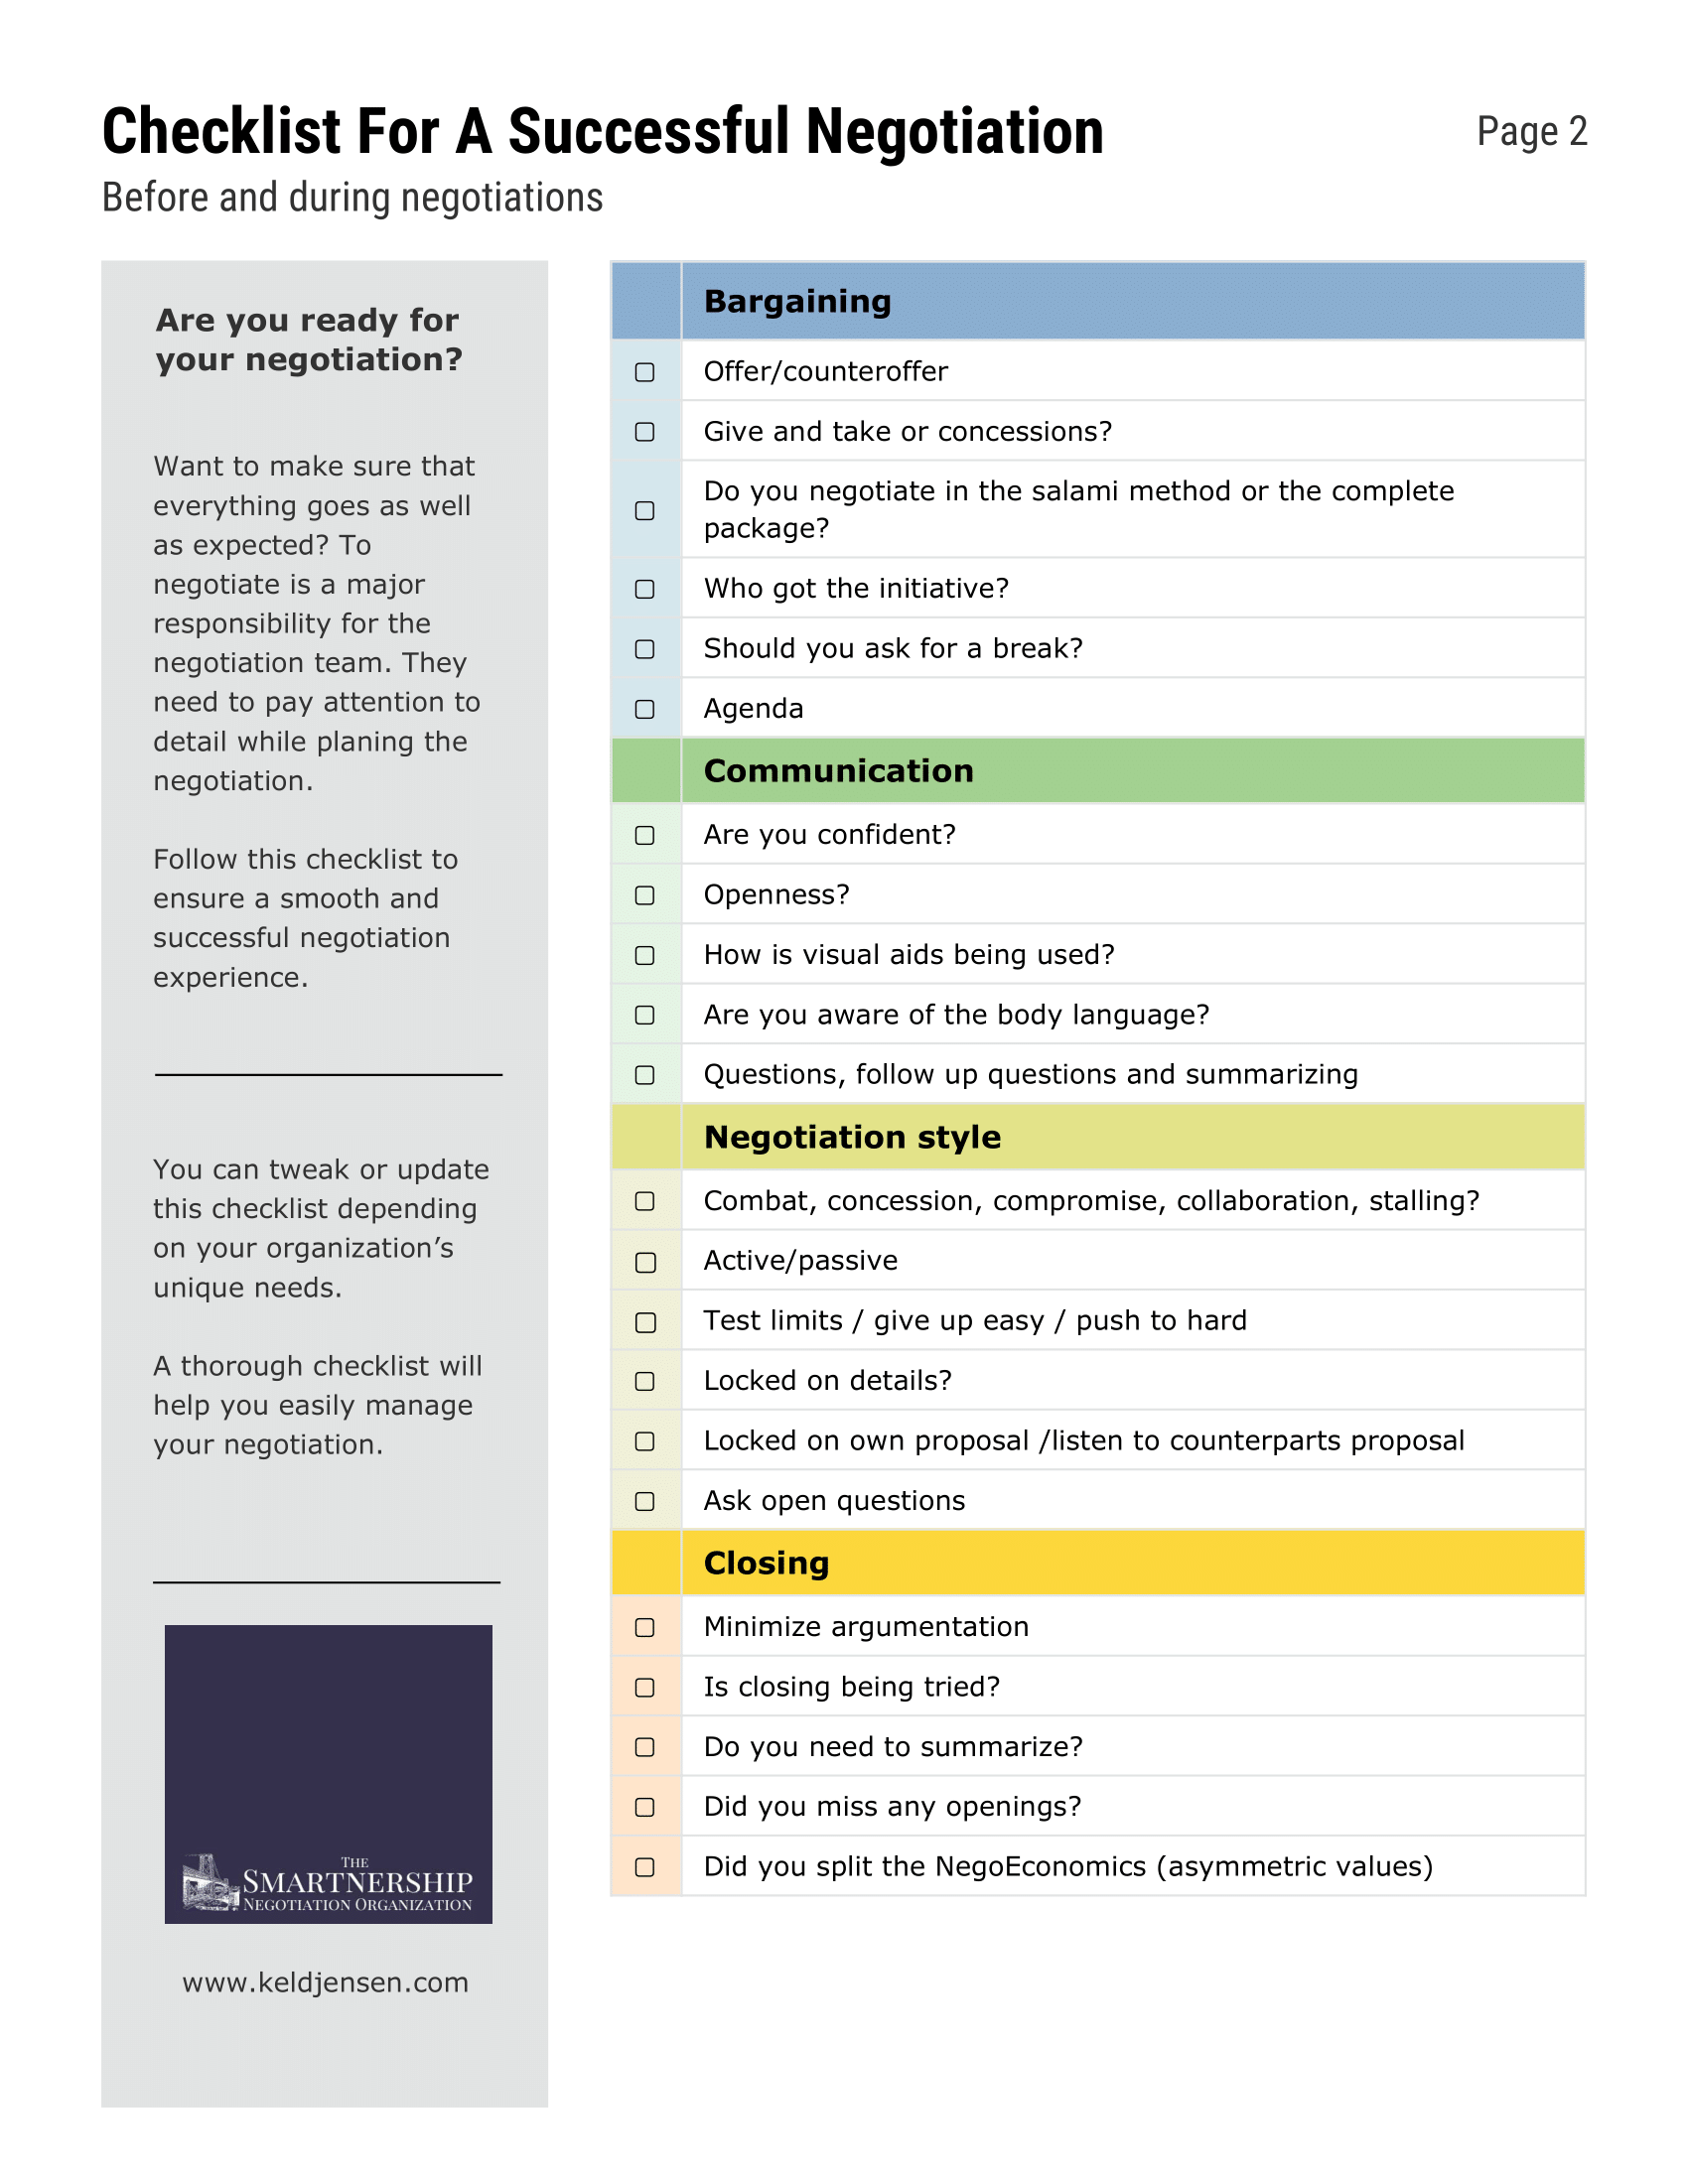 Checklist for Successful Negotiation 2